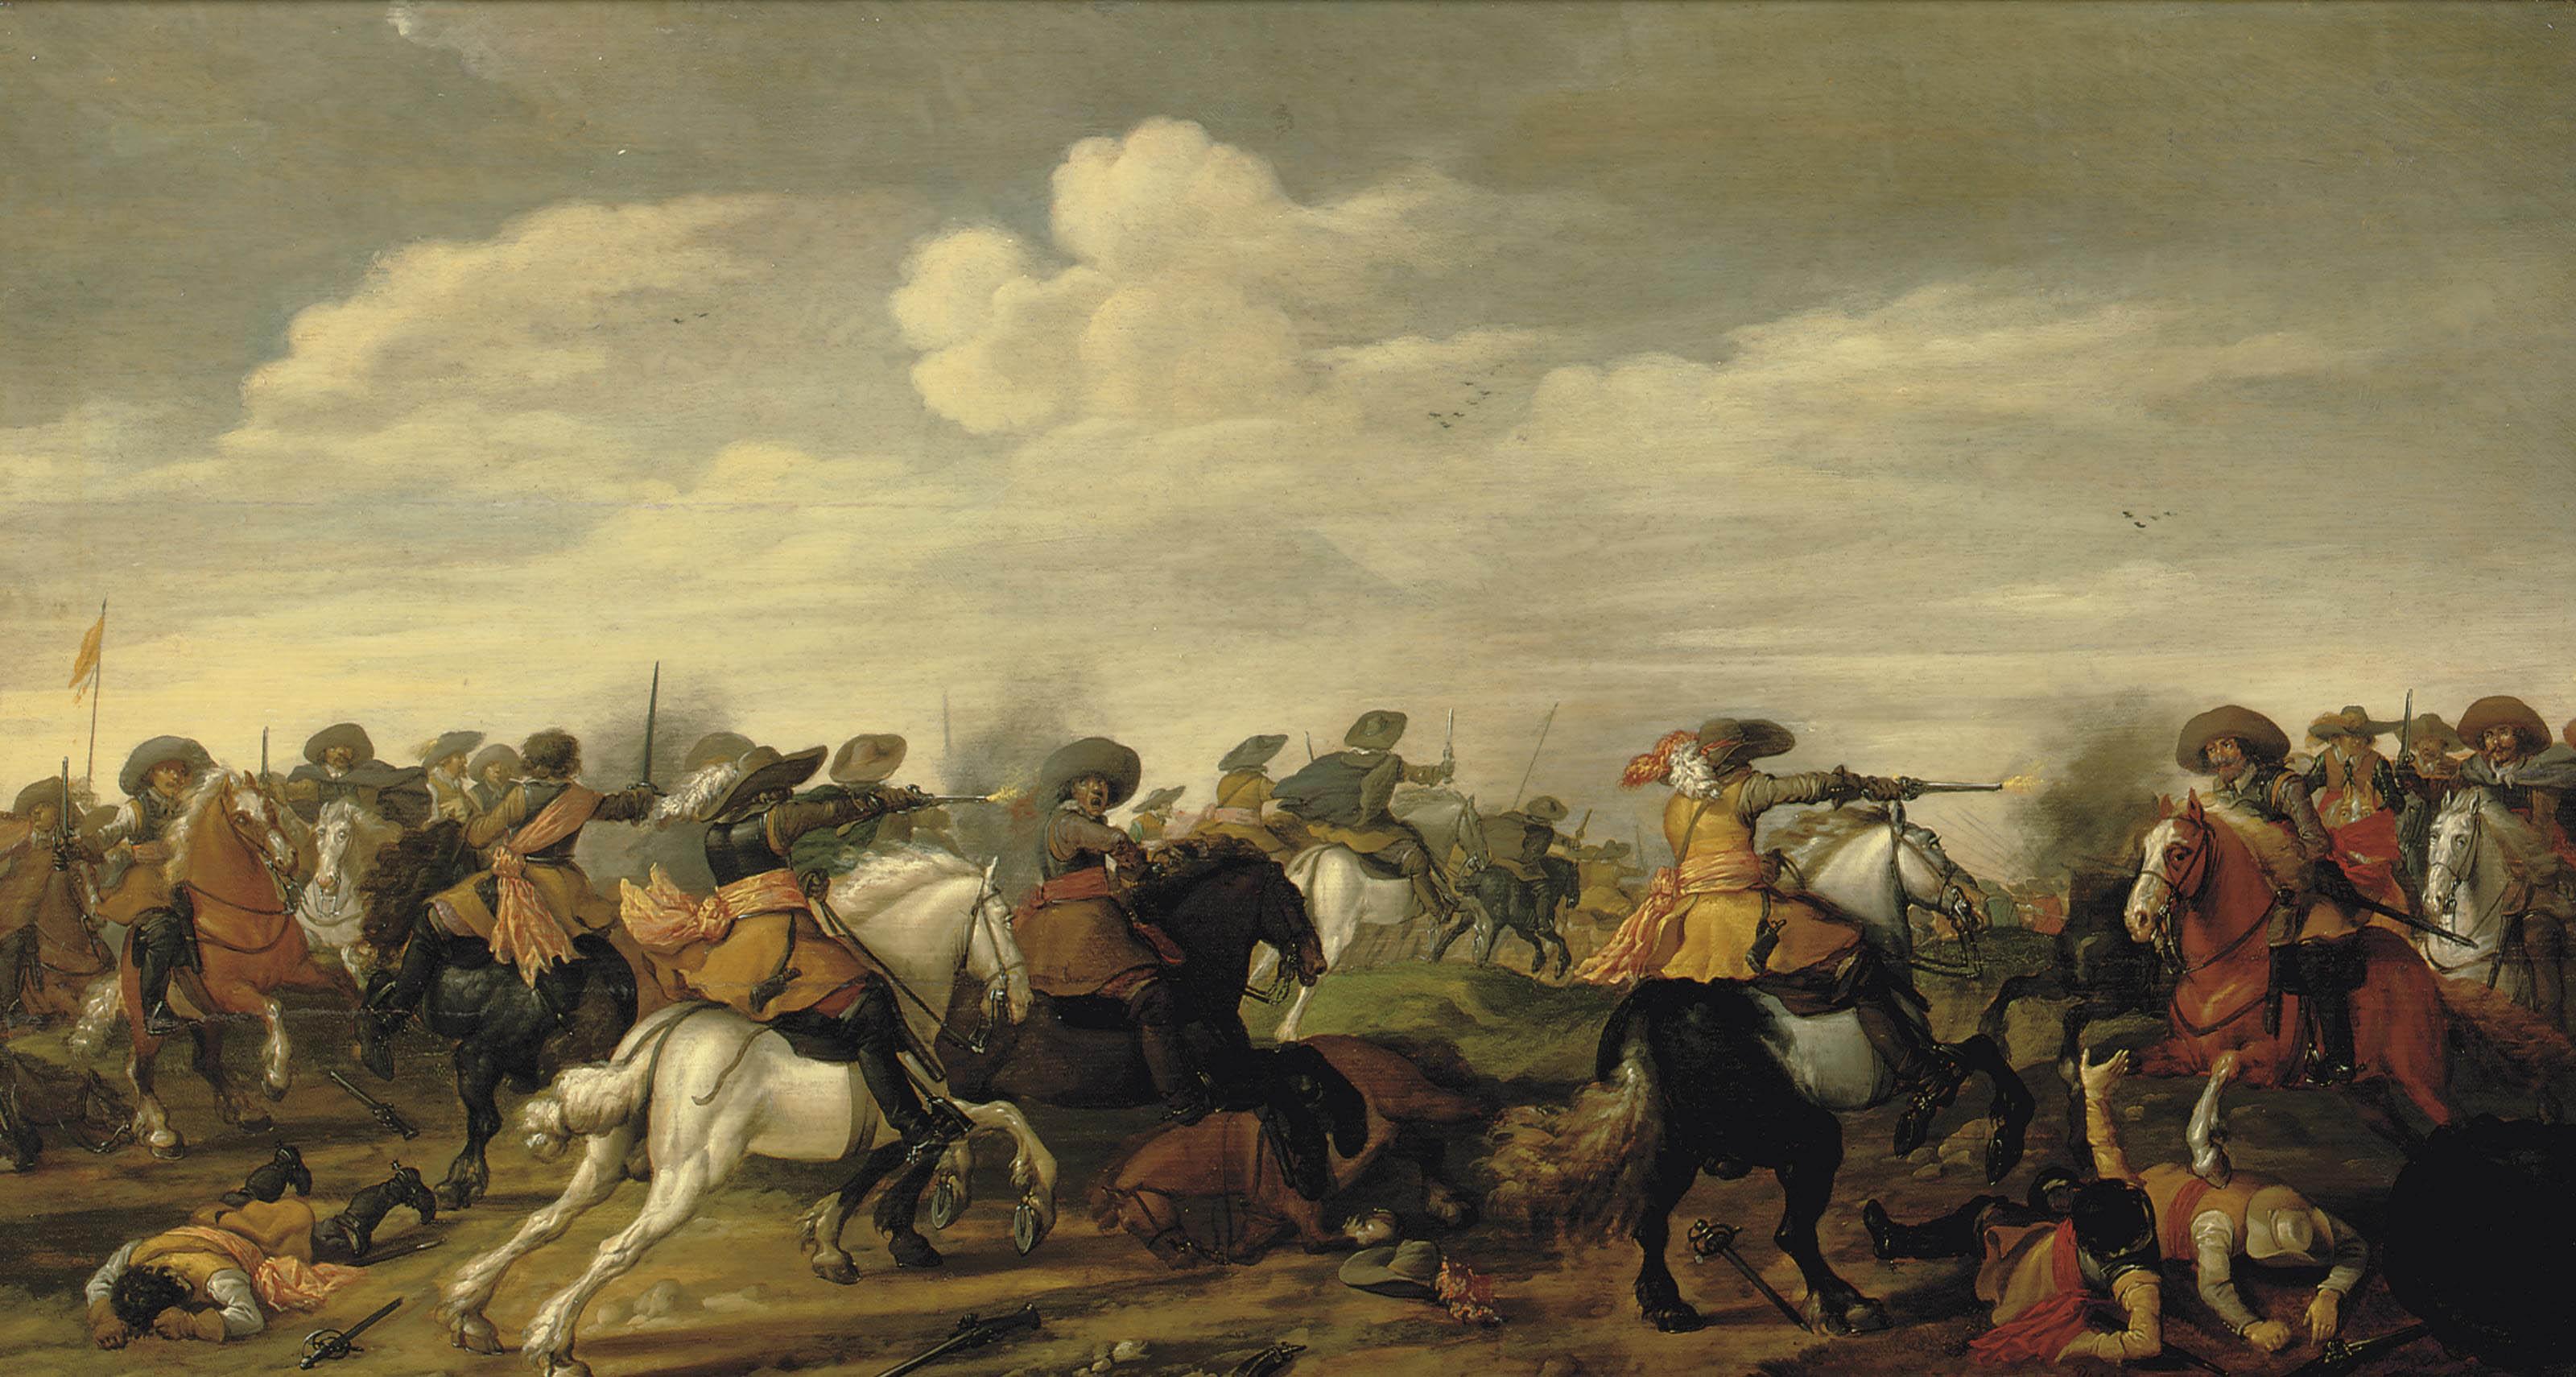 A cavalry skirmish in a landscape